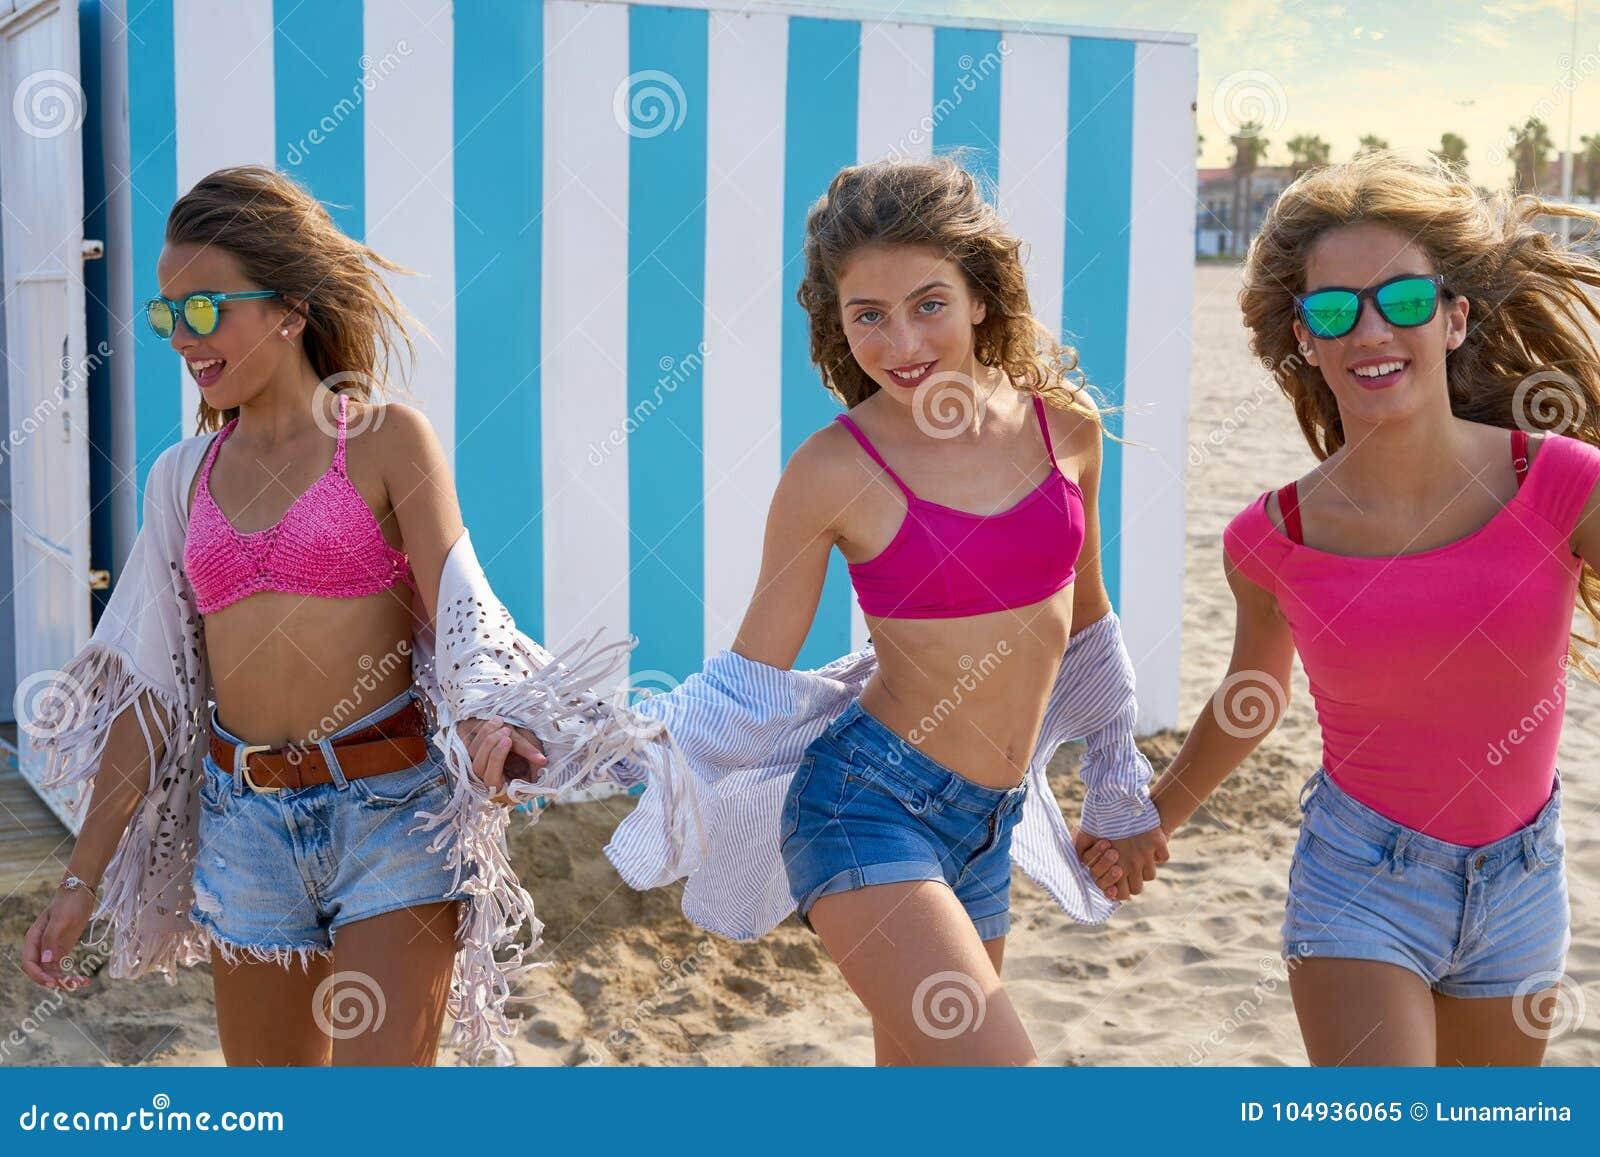 Corrida adolescente das meninas dos melhores amigos feliz na praia